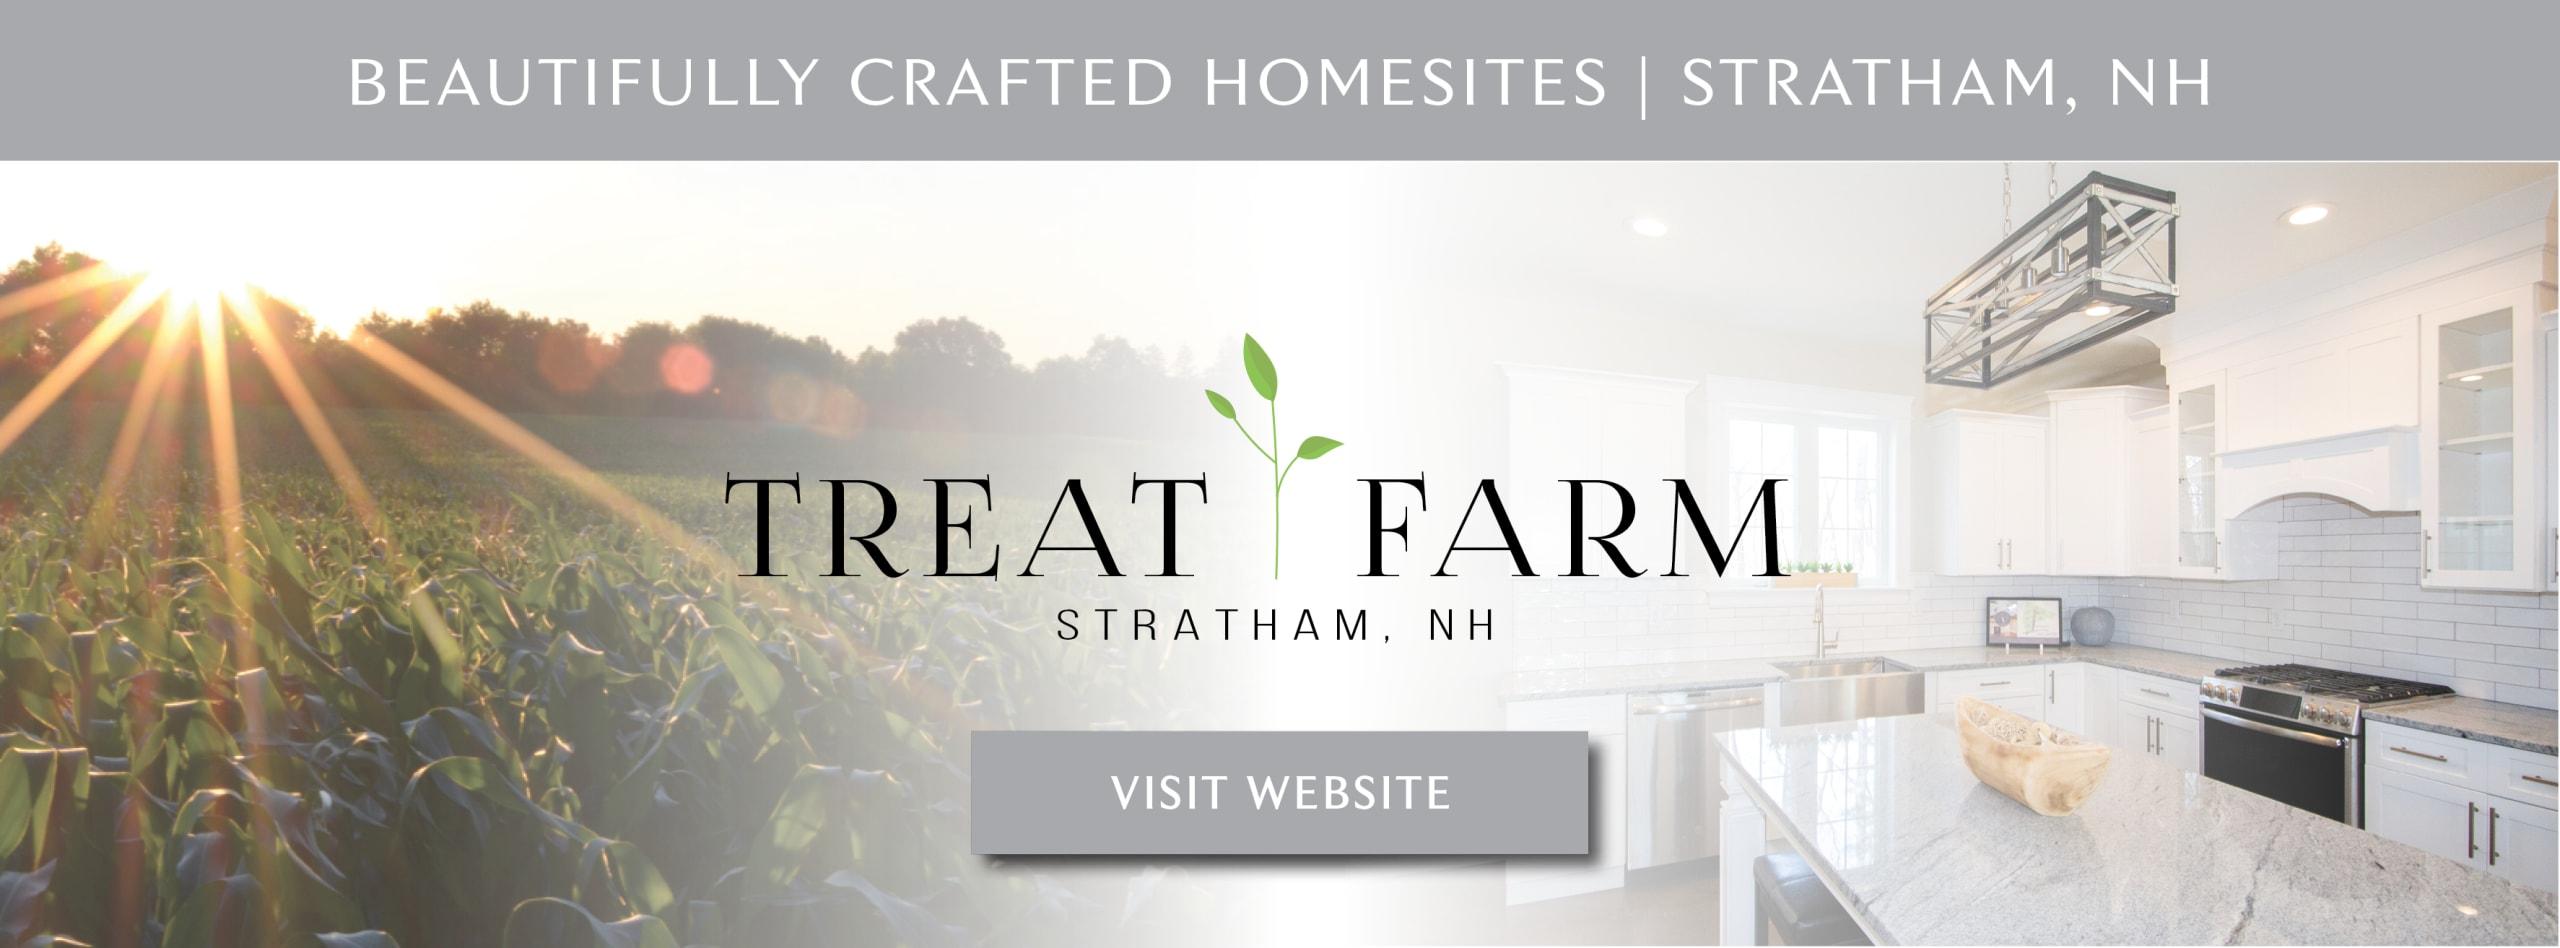 Treat Farm Banner